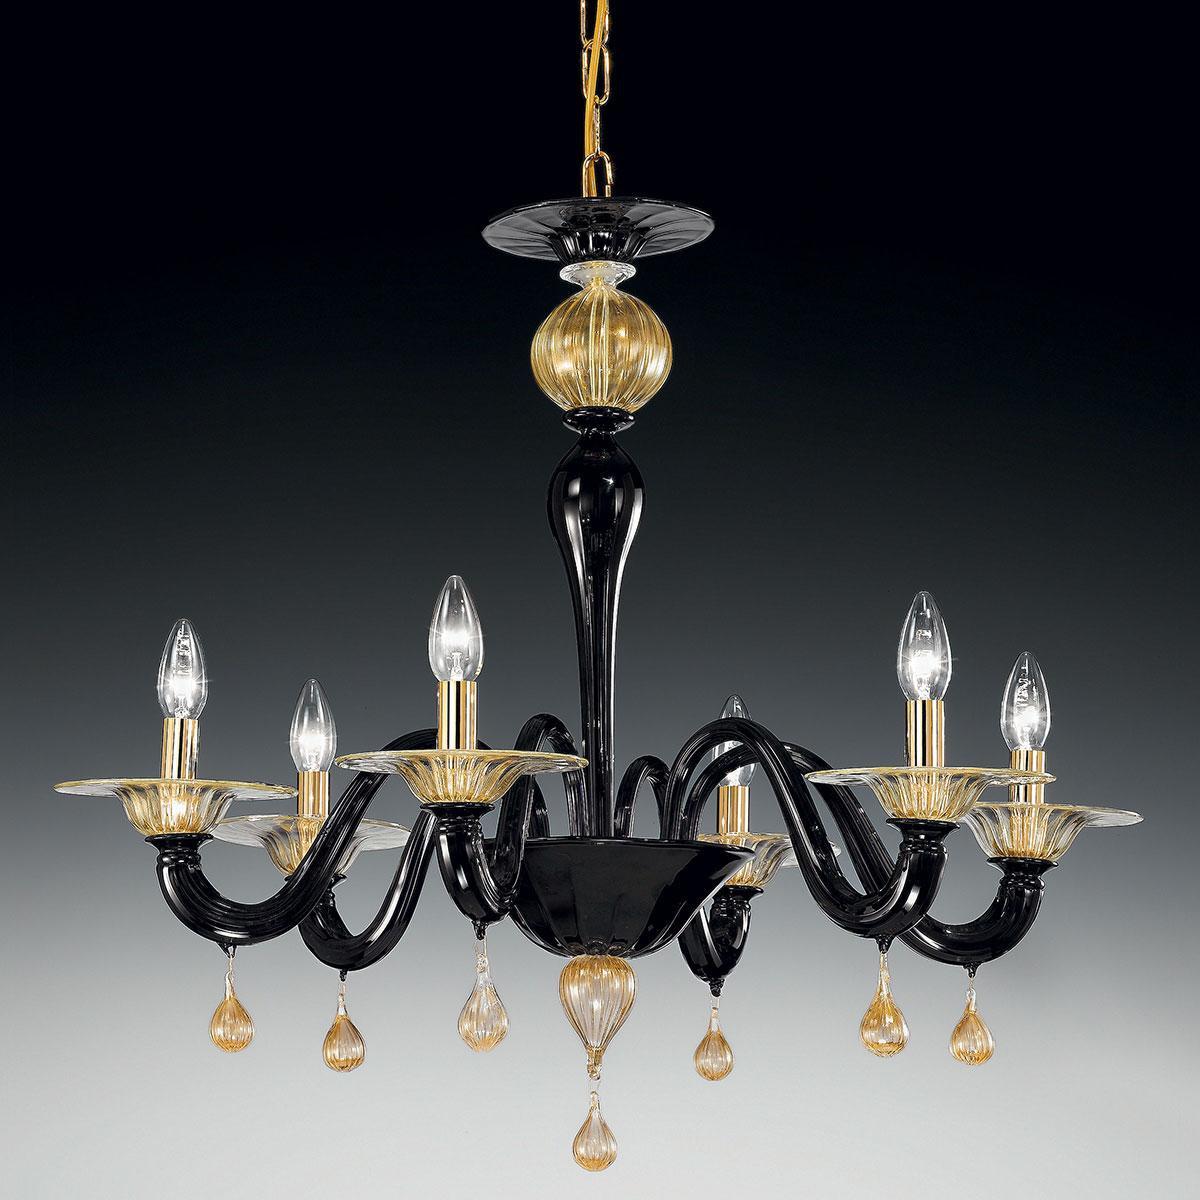 """Cabiri"" lampara de araña de Murano - 6 luces - negro y oro"